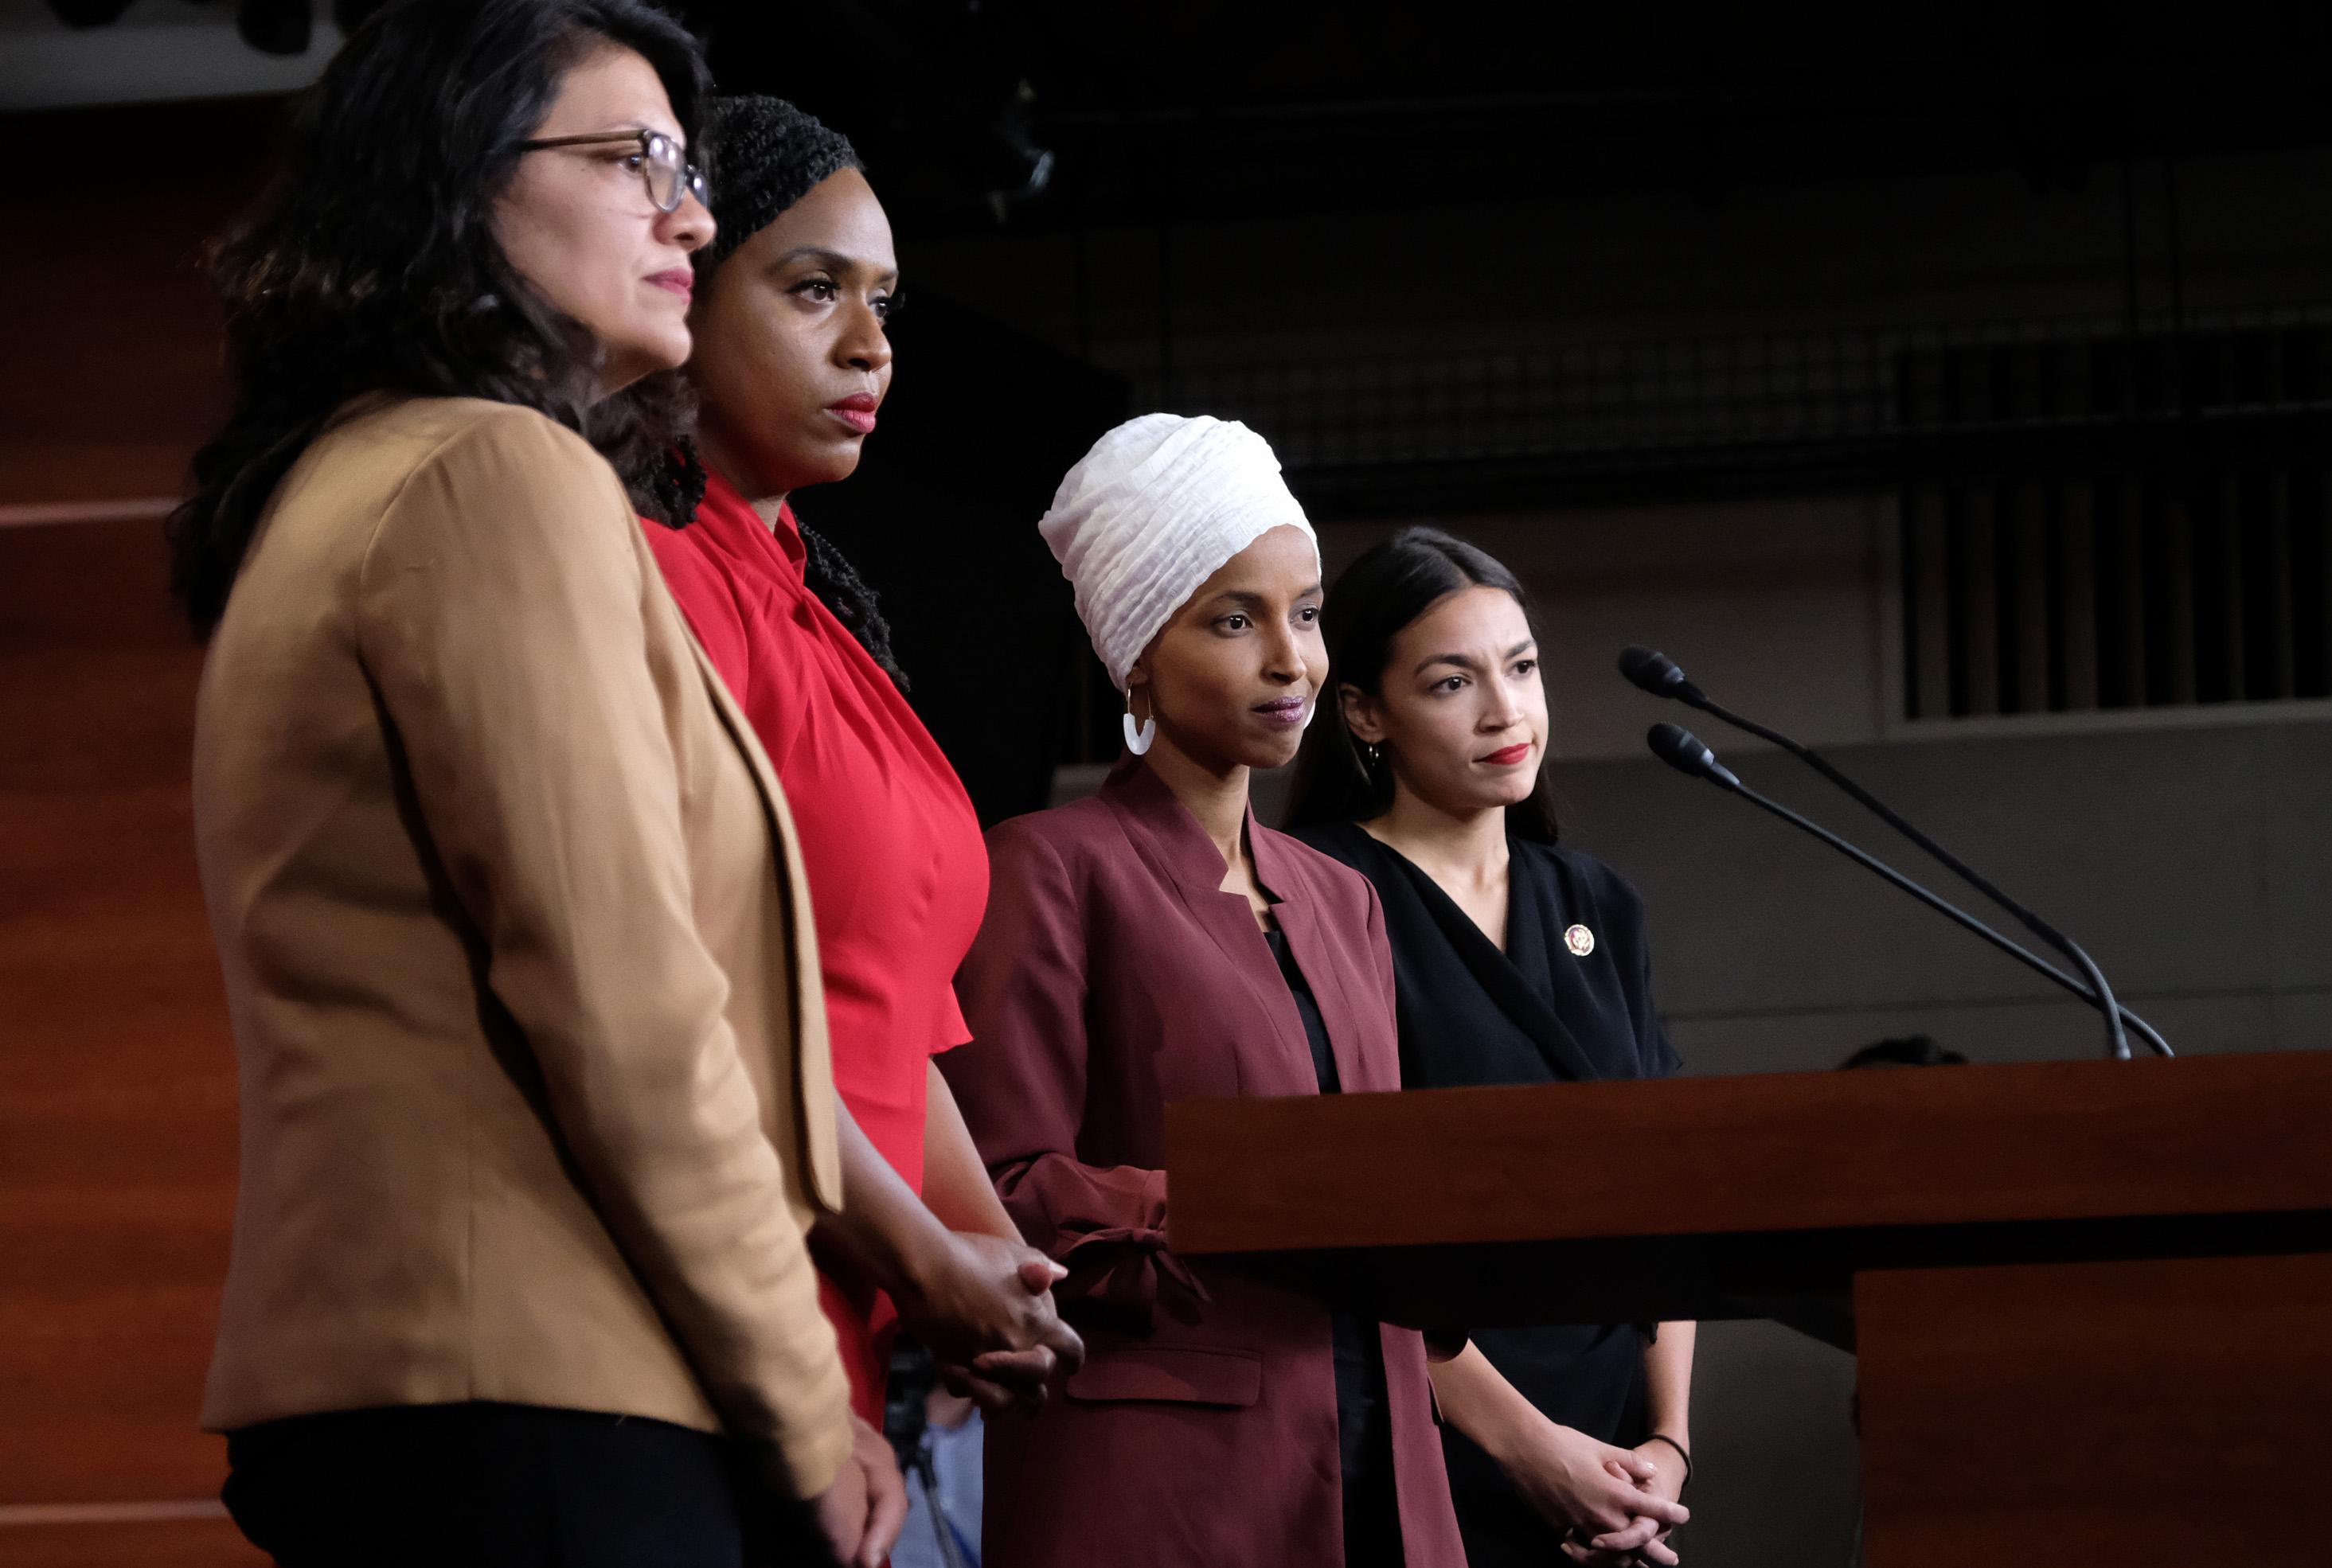 U.S. Rep. Rashida Tlaib (D-MI), Rep. Ayanna Pressley (D-MA), Rep. Ilhan Omar (D-MN), and Rep. Alexandria Ocasio-Cortez (D-NY) at a press conference at the U.S. Capitol on July 15, 2019 in Washington, DC